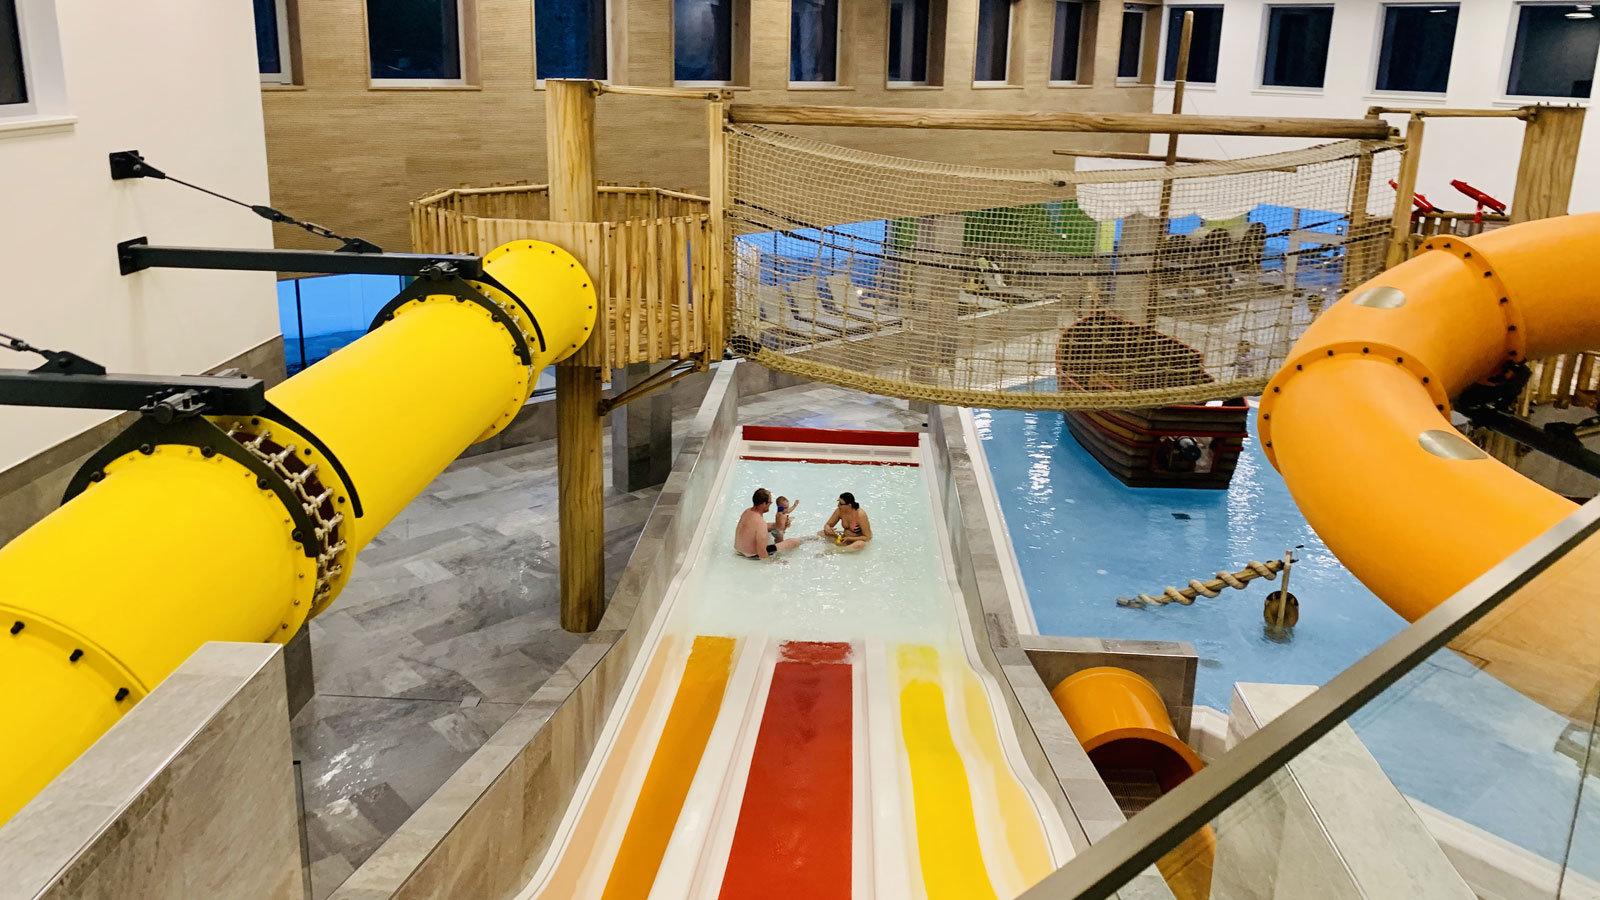 DIDIs-Wasserwelt-Zugspitz-Resort @ Foto: Andrea Fischer, Trips4Kids.de